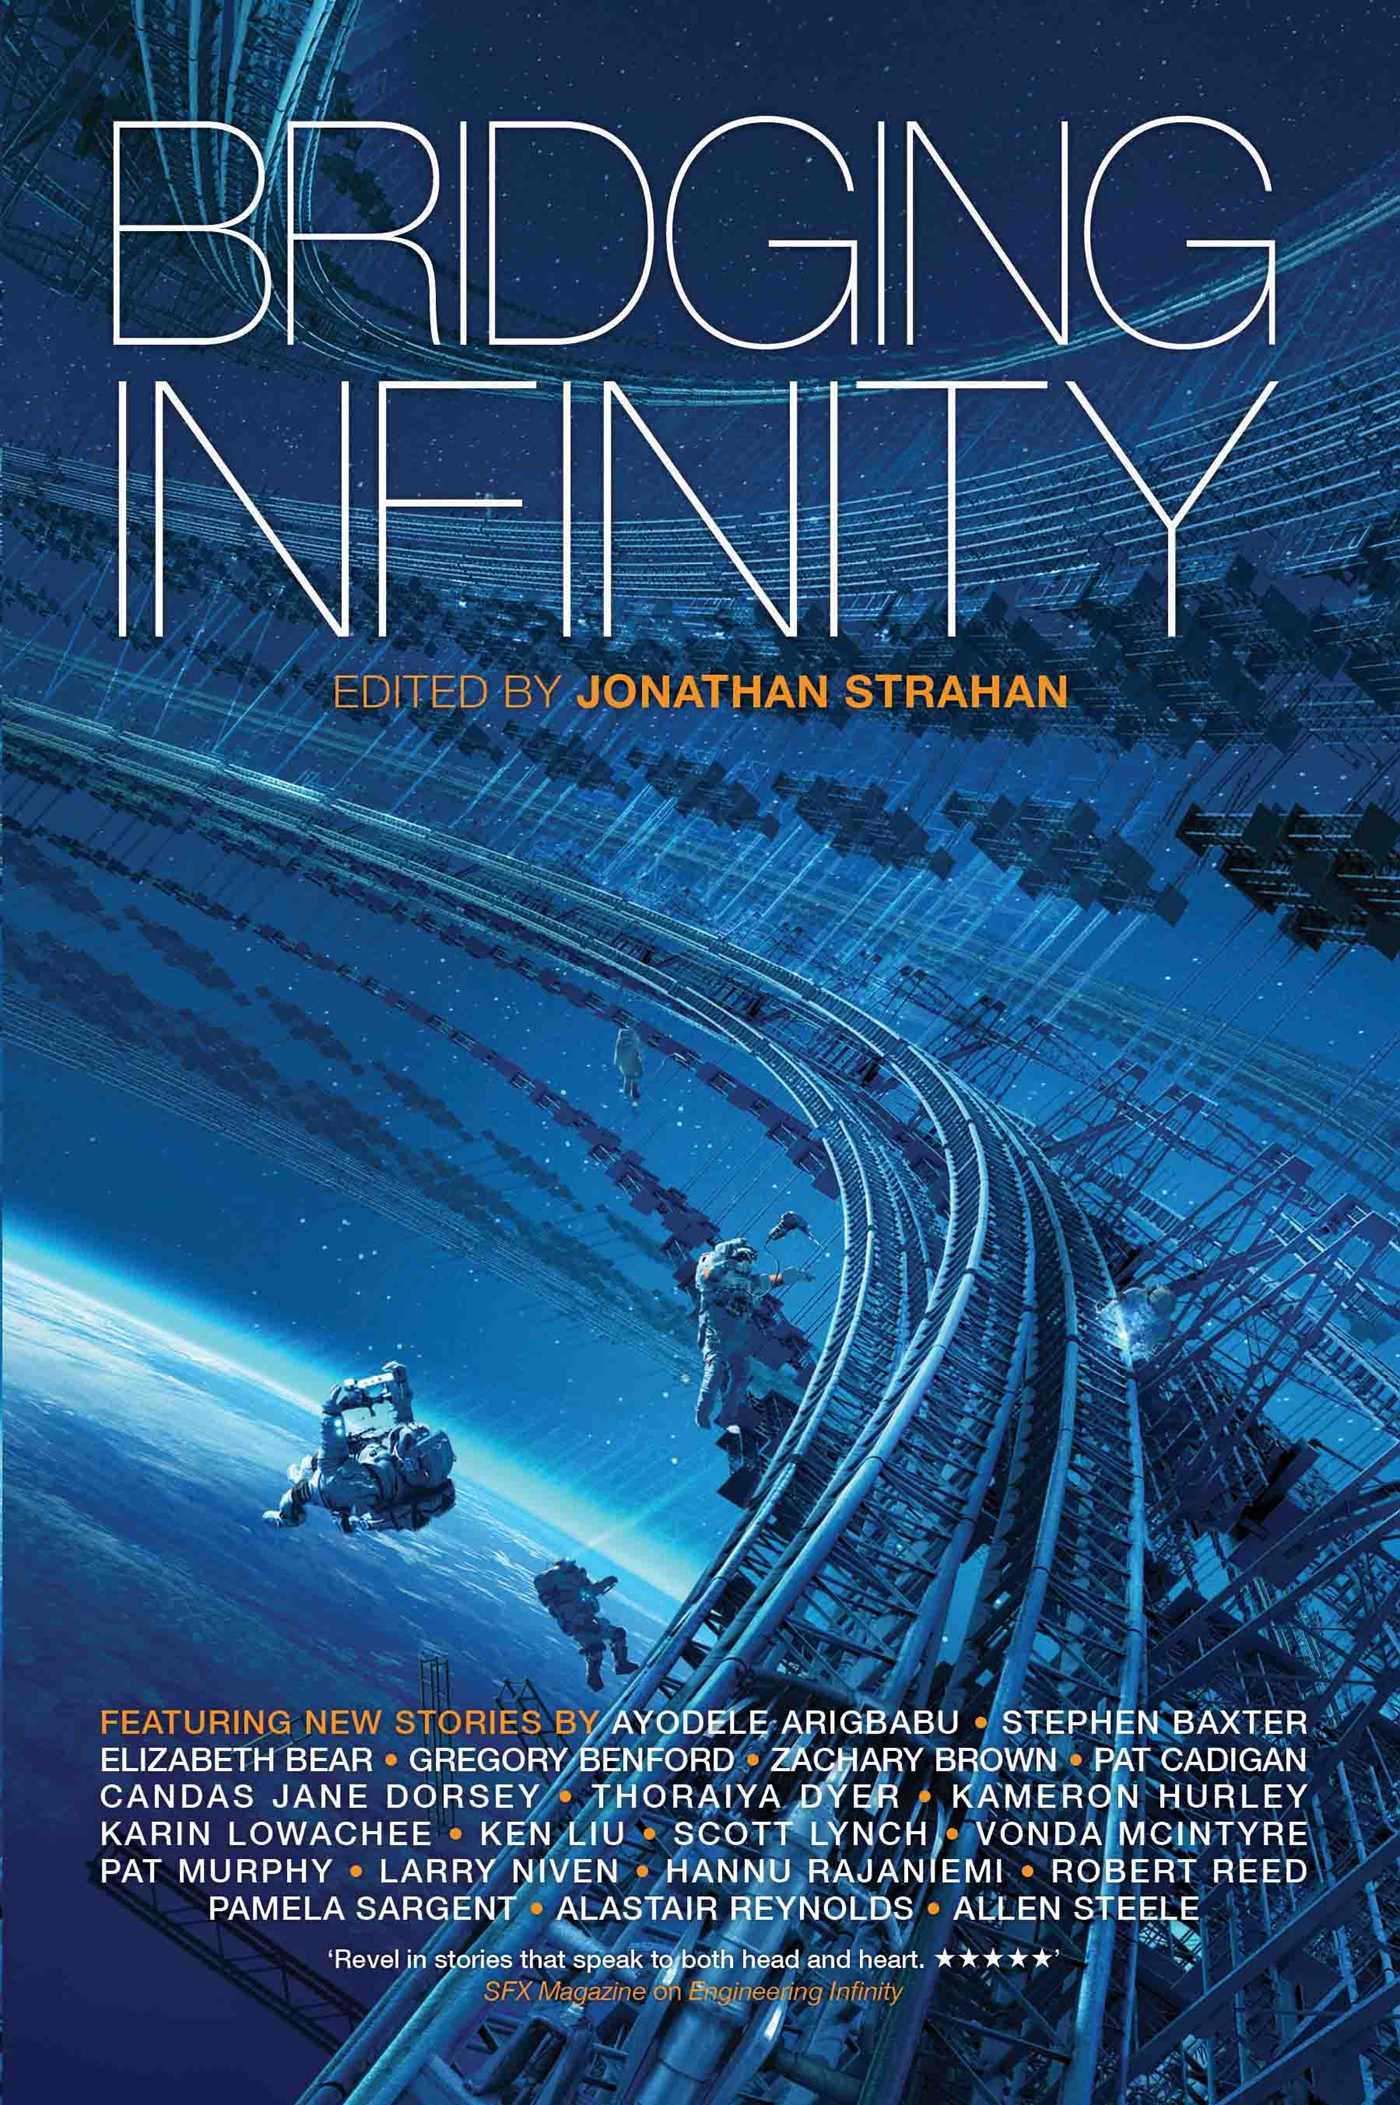 Bridging infinity 9781781084199 hr